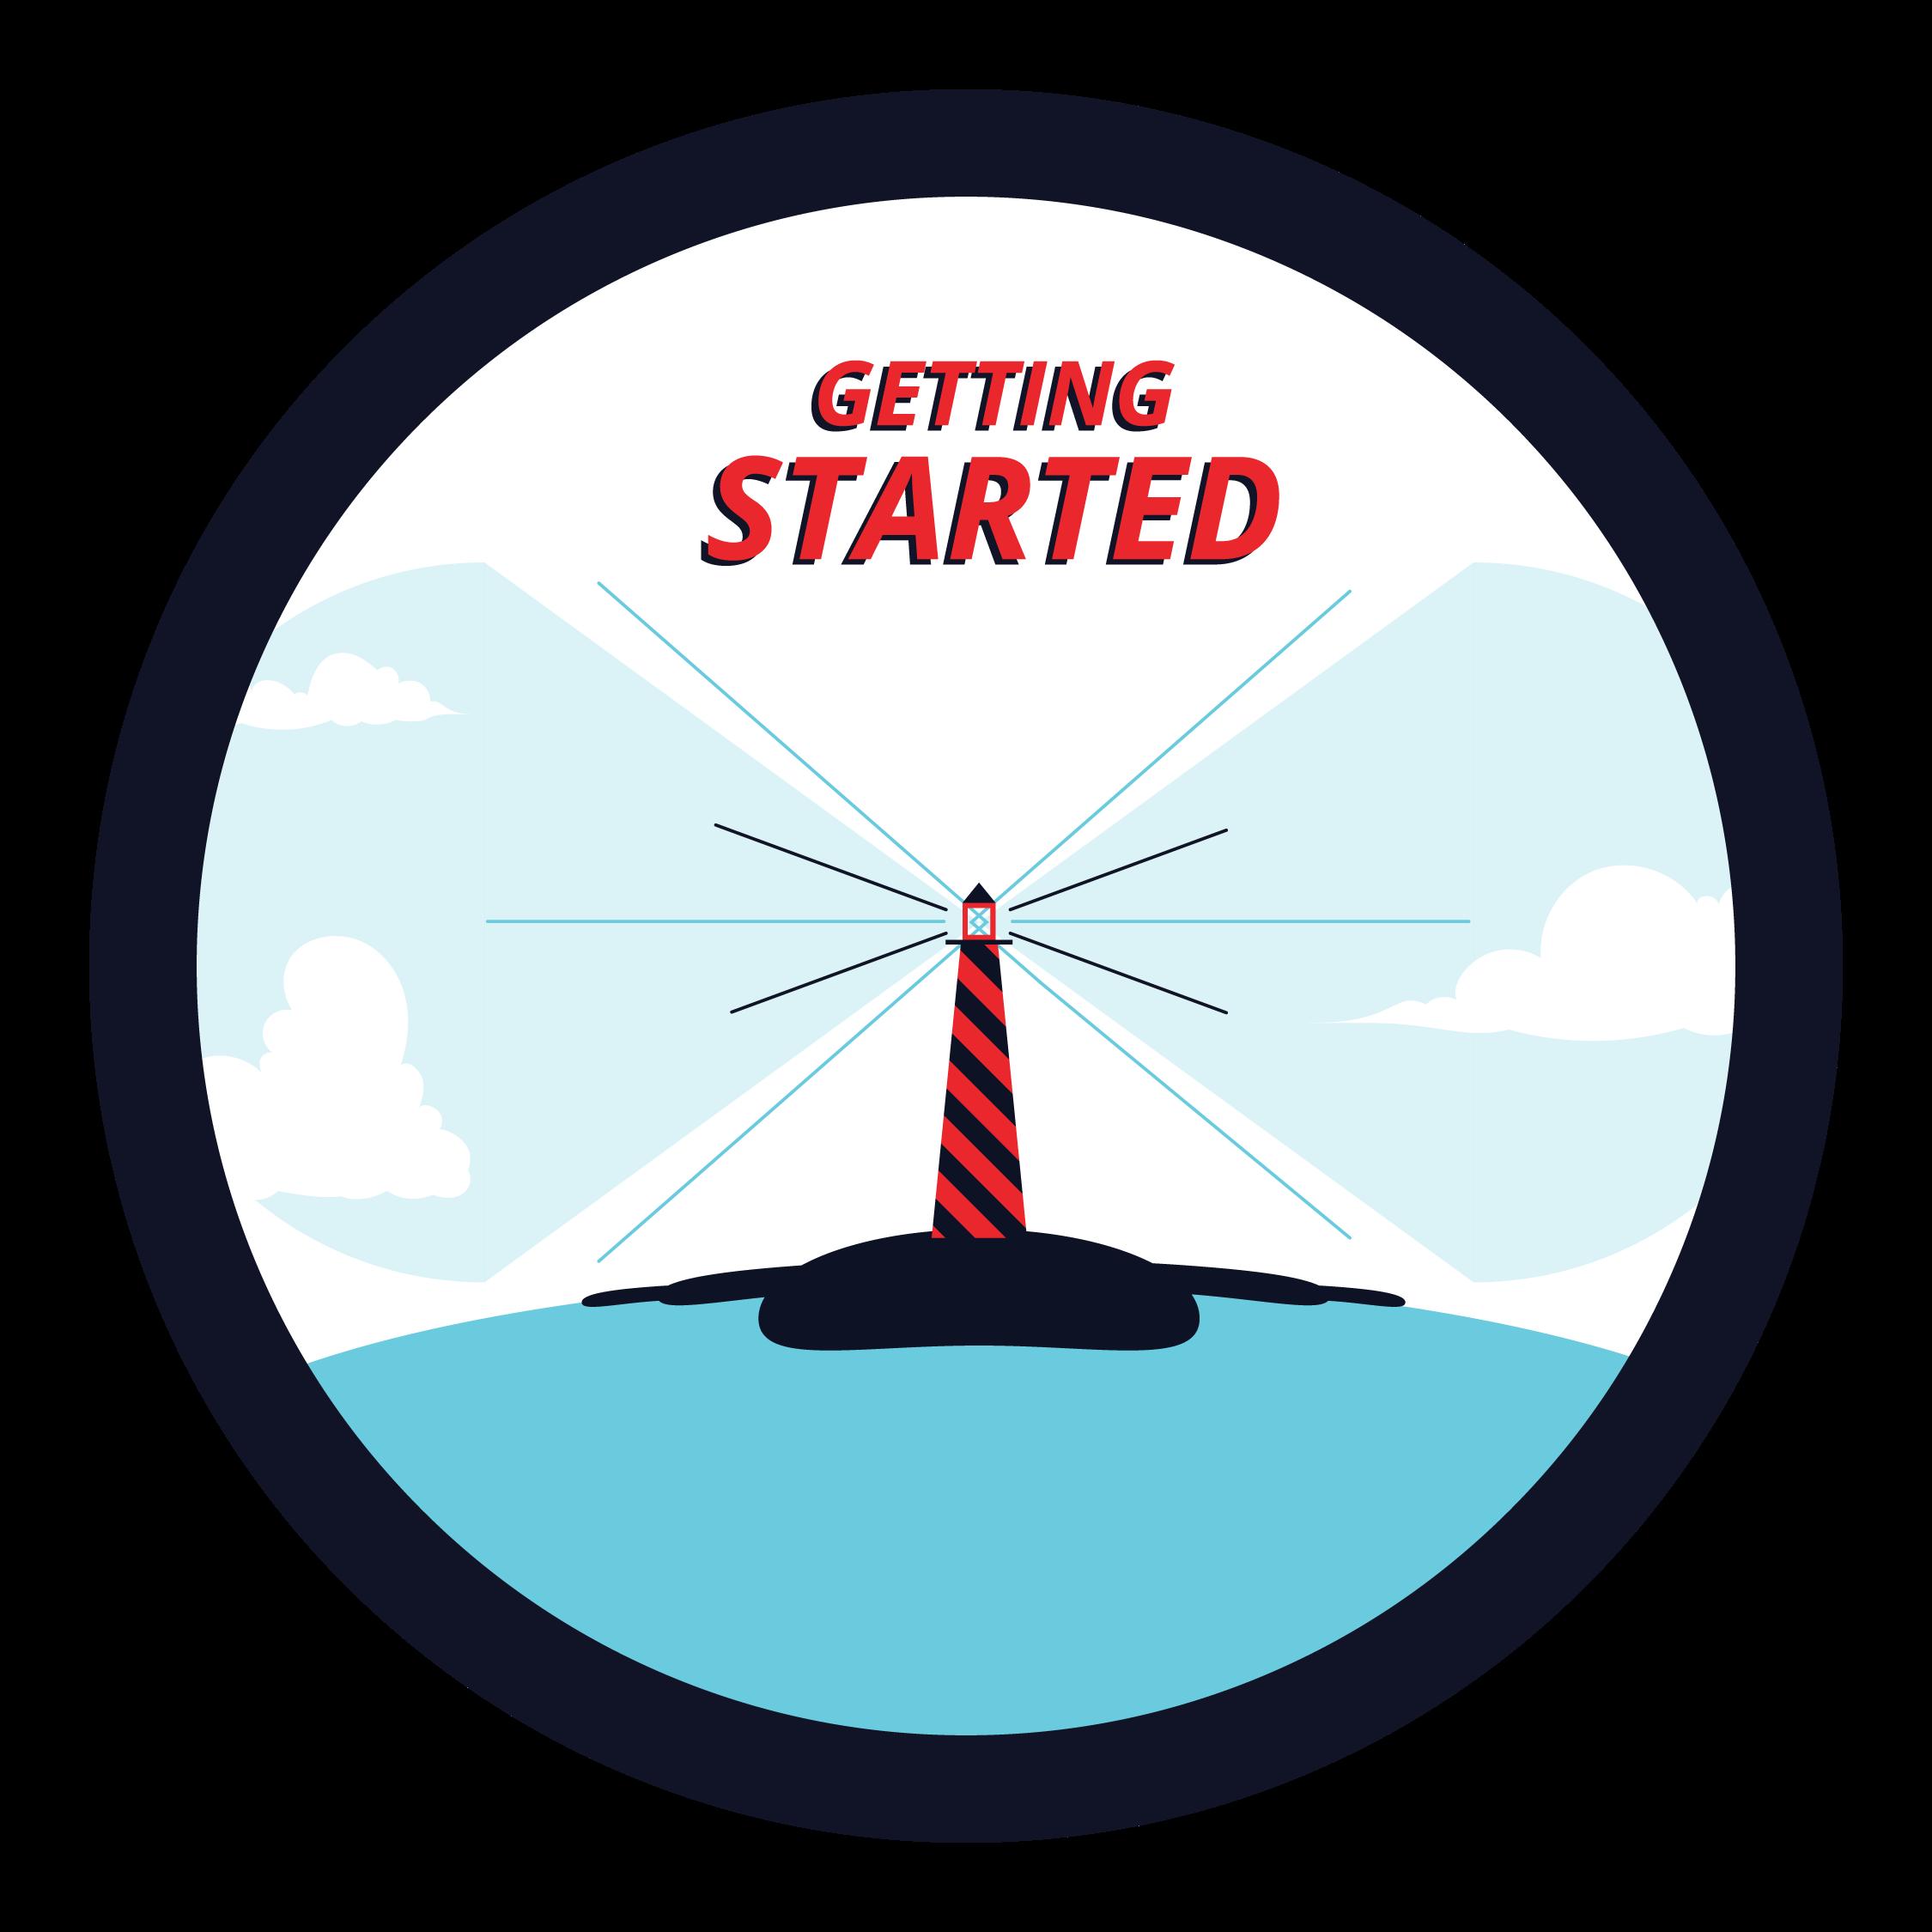 Dockwa_Learn_GettingStarted_A